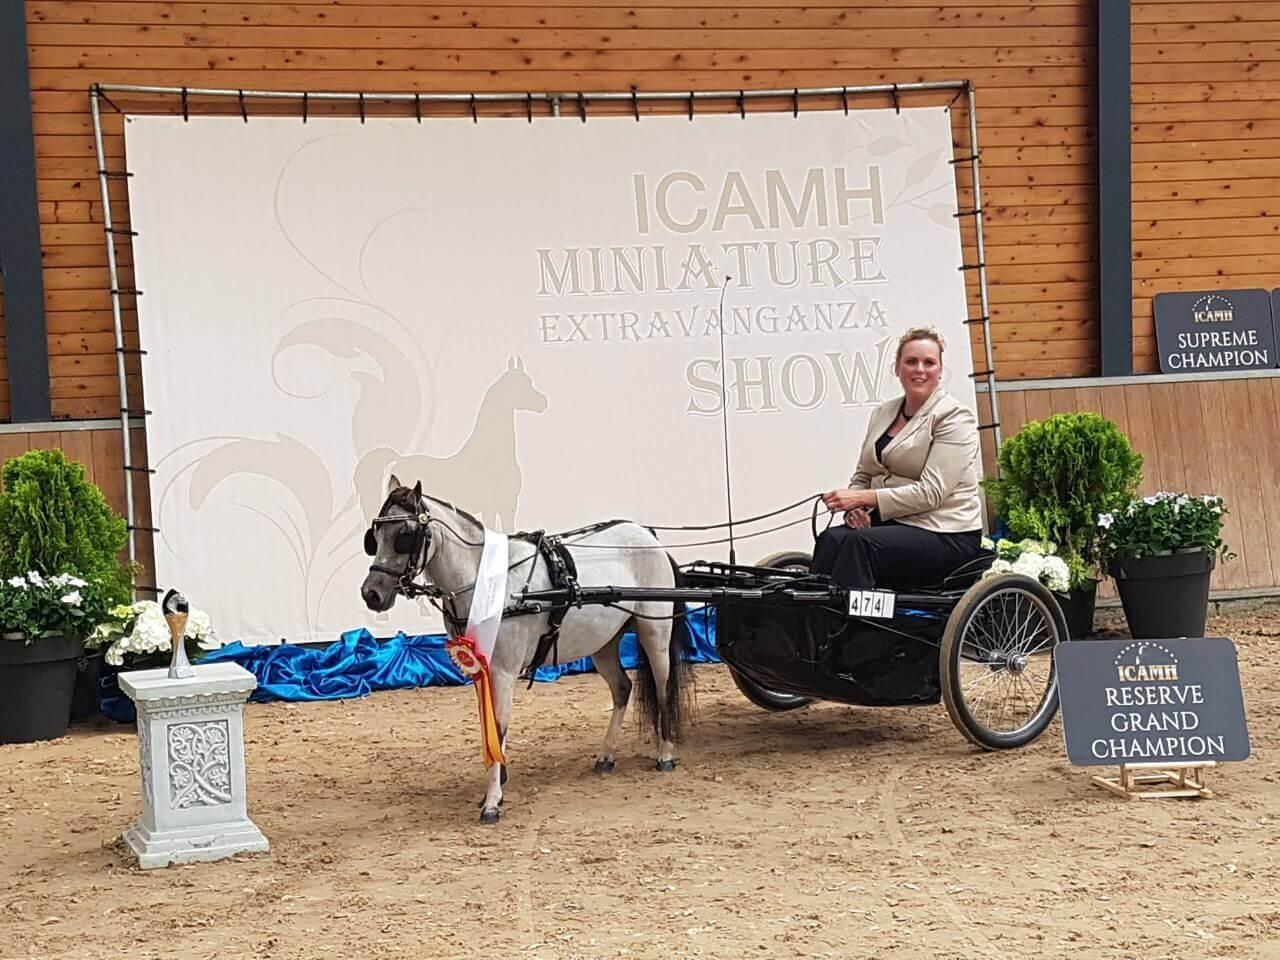 ICAMH Extravaganza Show 2017